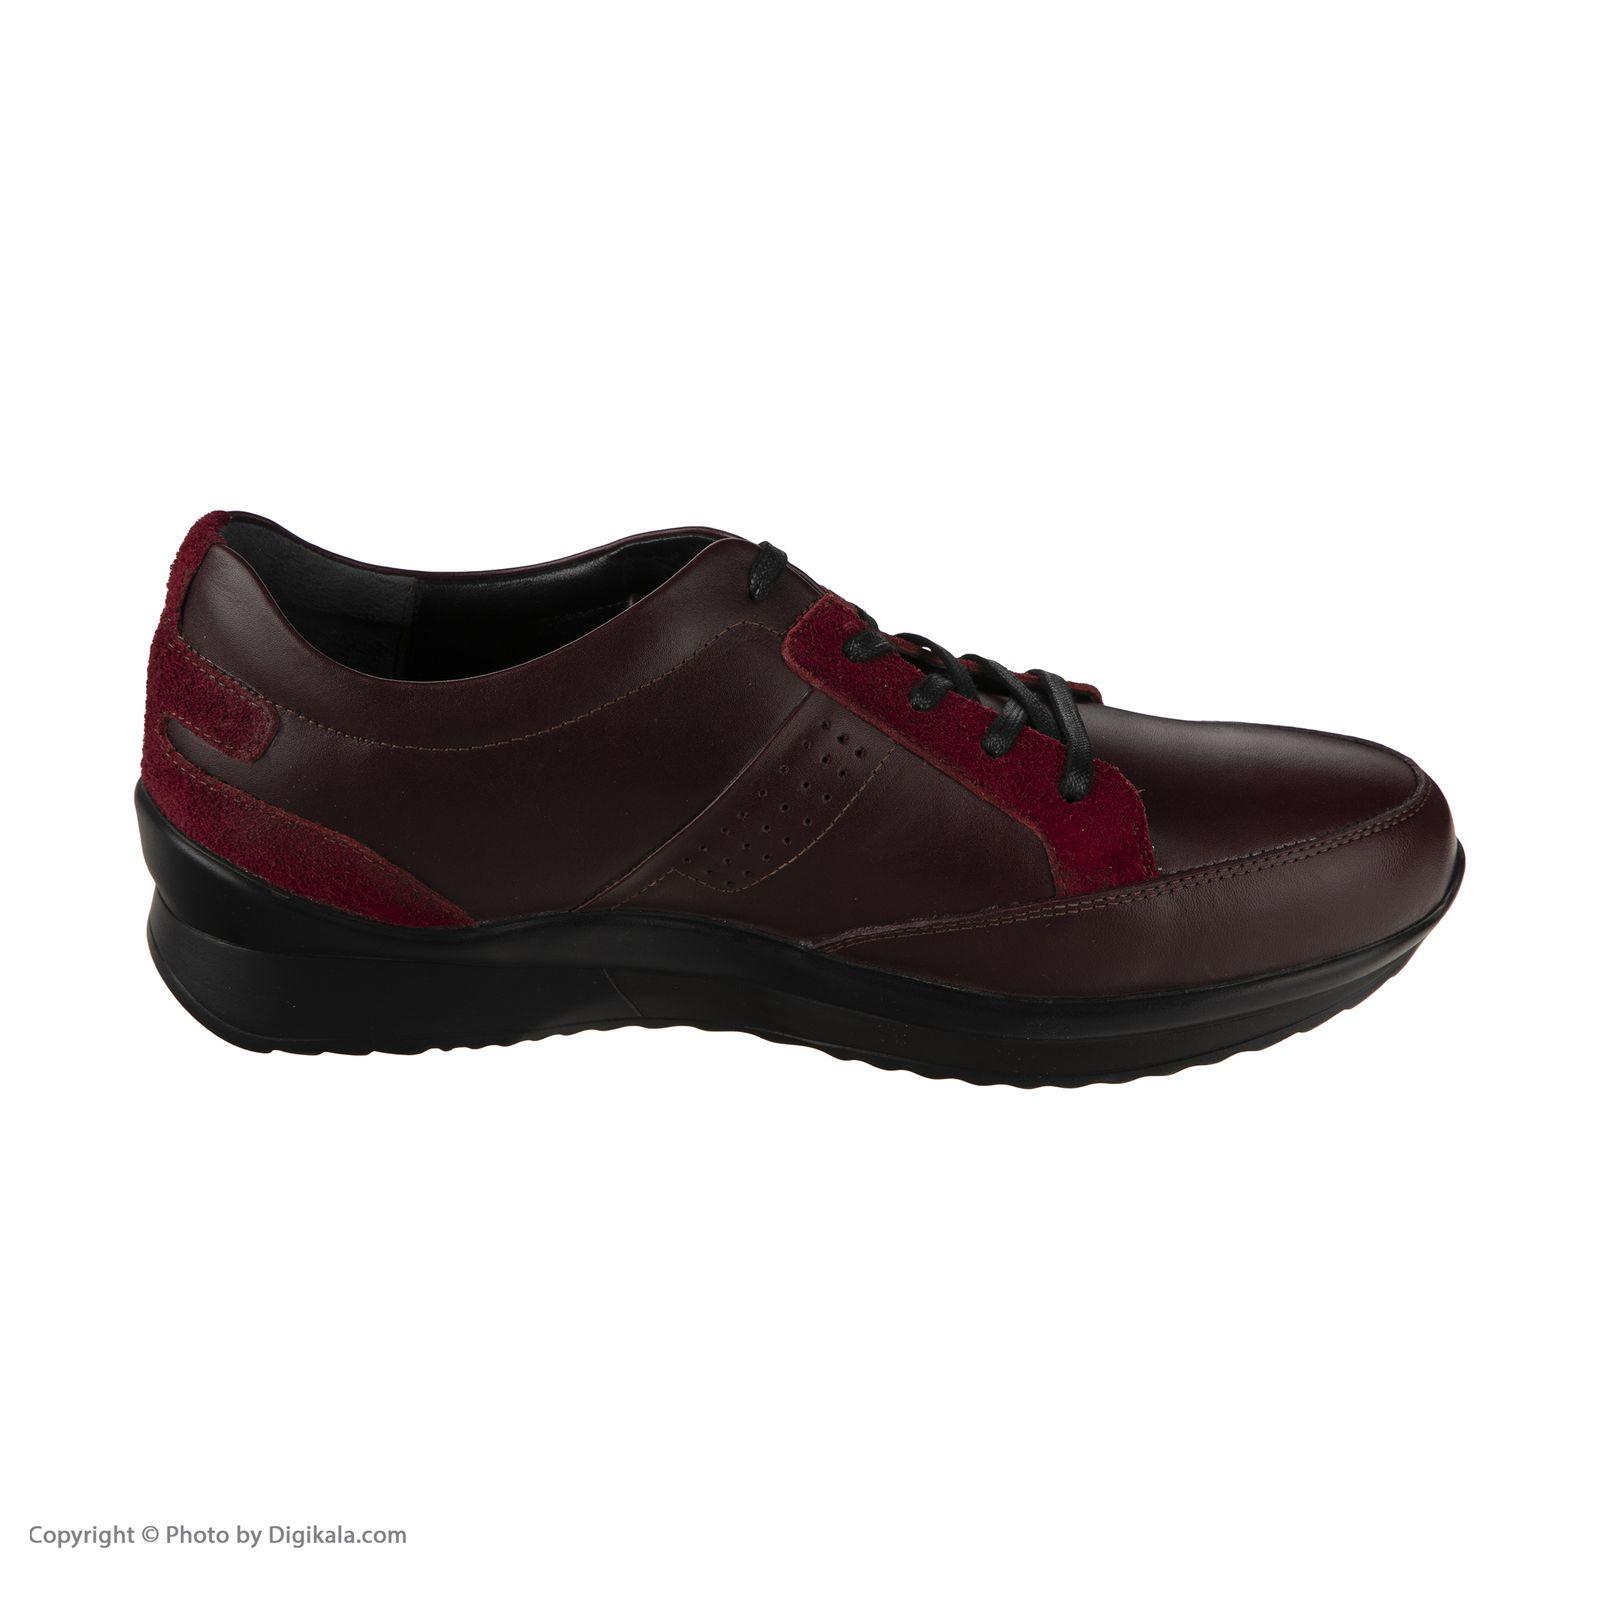 کفش روزمره مردانه چرمیران مدل 0389-Toma-005 -  - 7